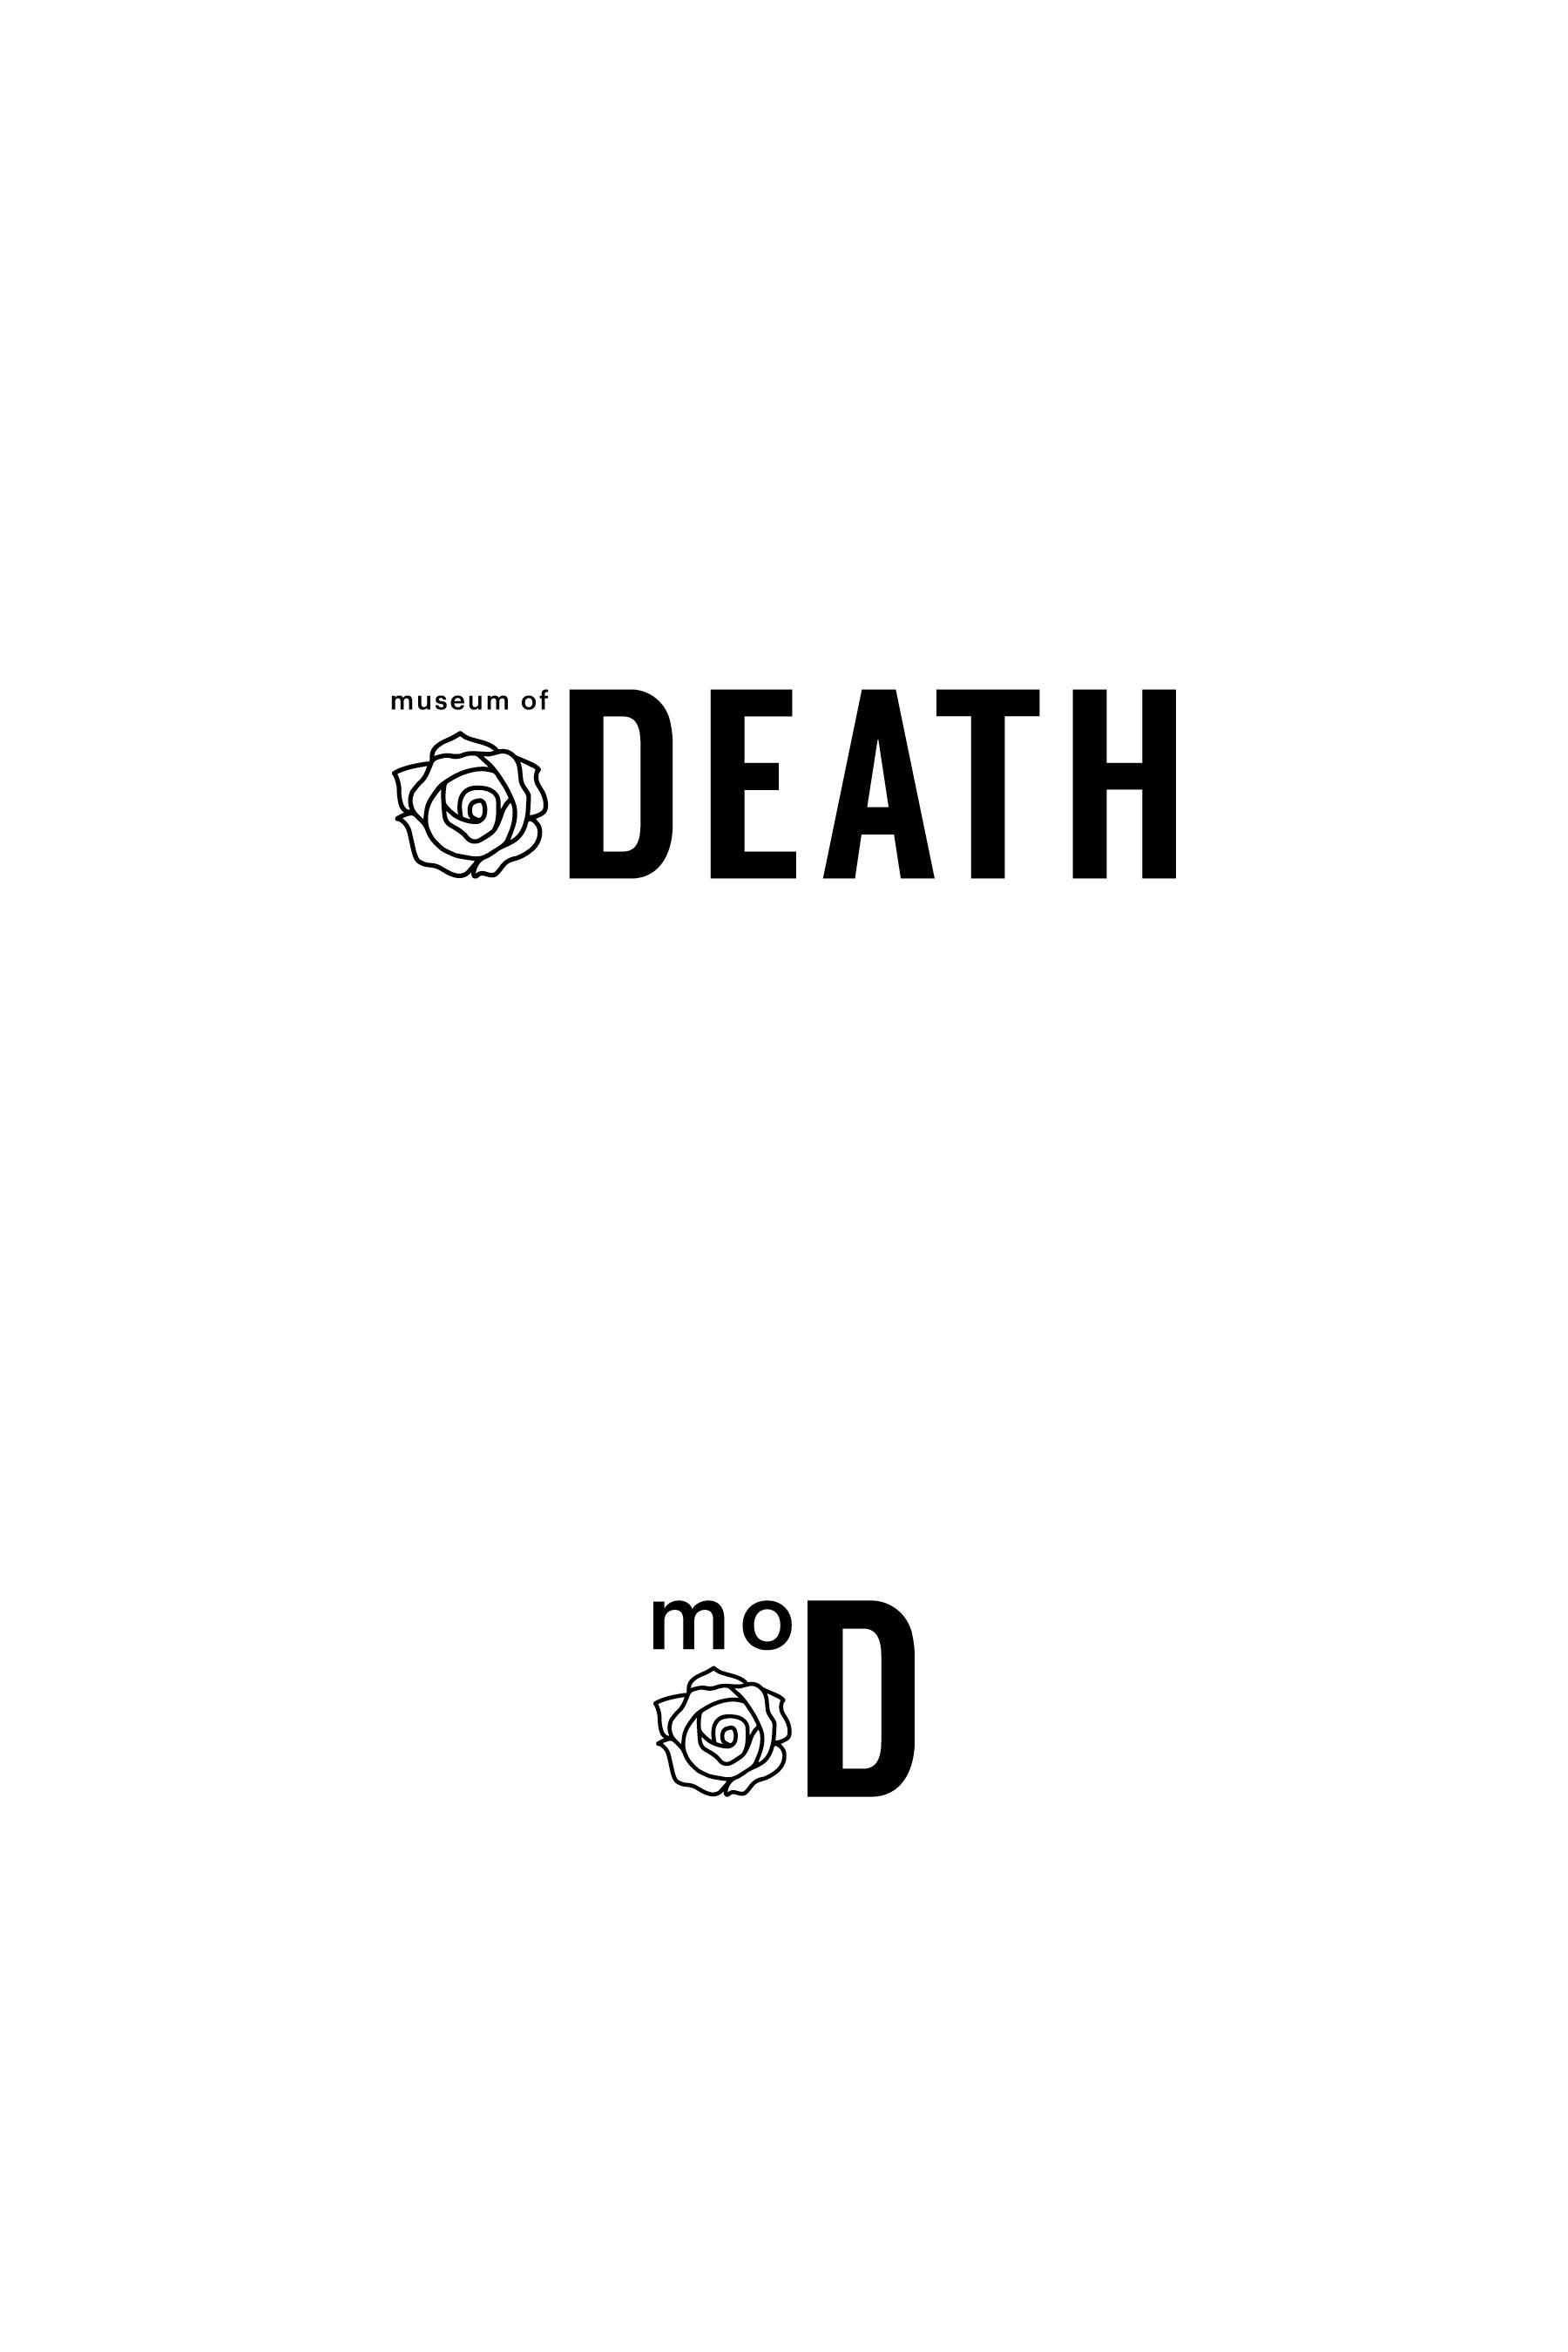 logo_format_01.png